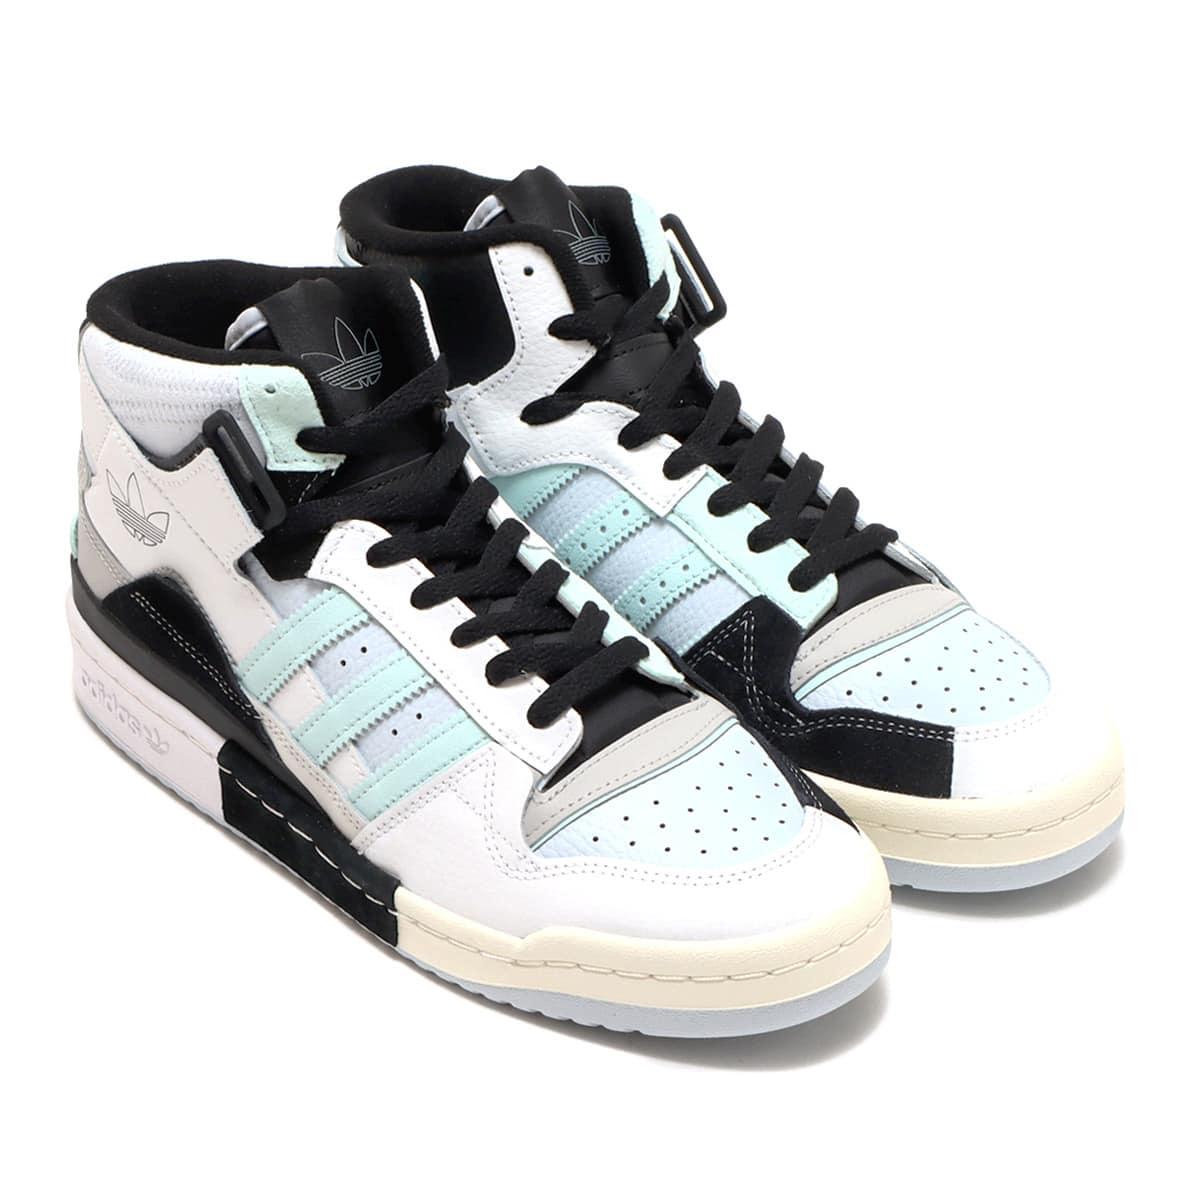 adidas FORUM EXHIBIT MID FOOTWEAR WHITE/GRAY TWO/HALO MINT 21FW-I_photo_large